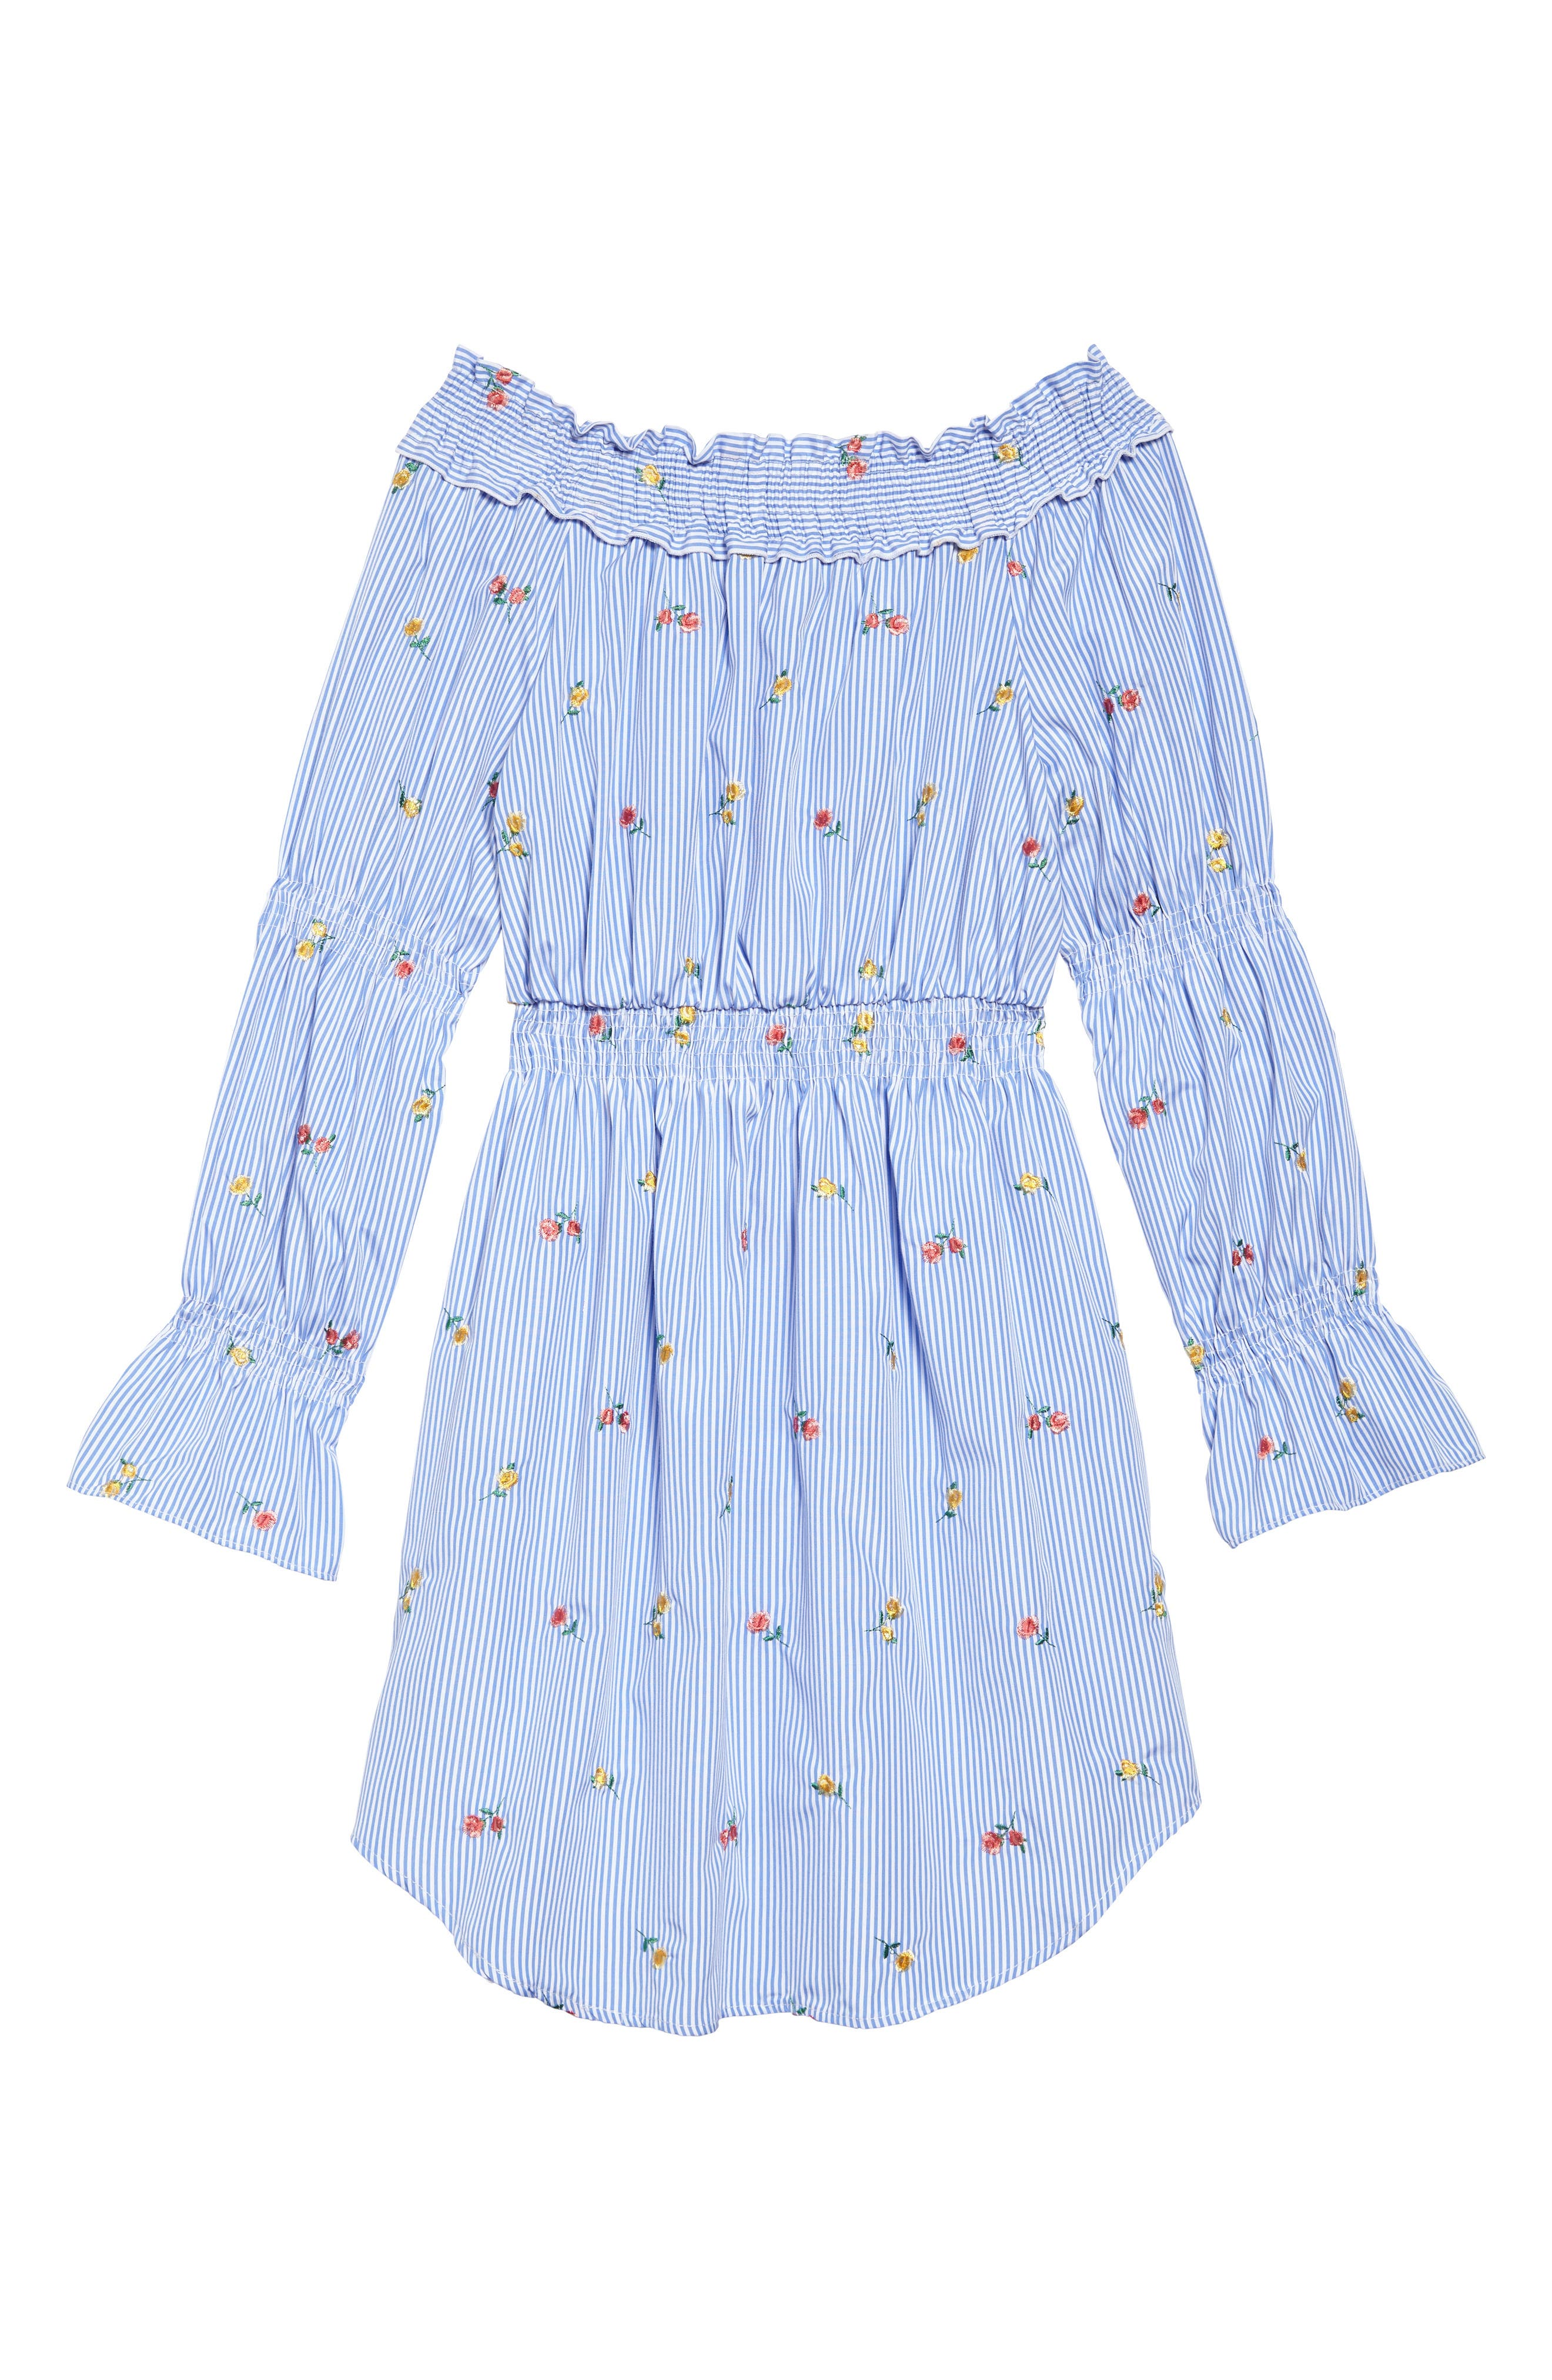 Floral Embroidery Stripe Off the Shoulder Dress,                         Main,                         color, Light Blue/ White